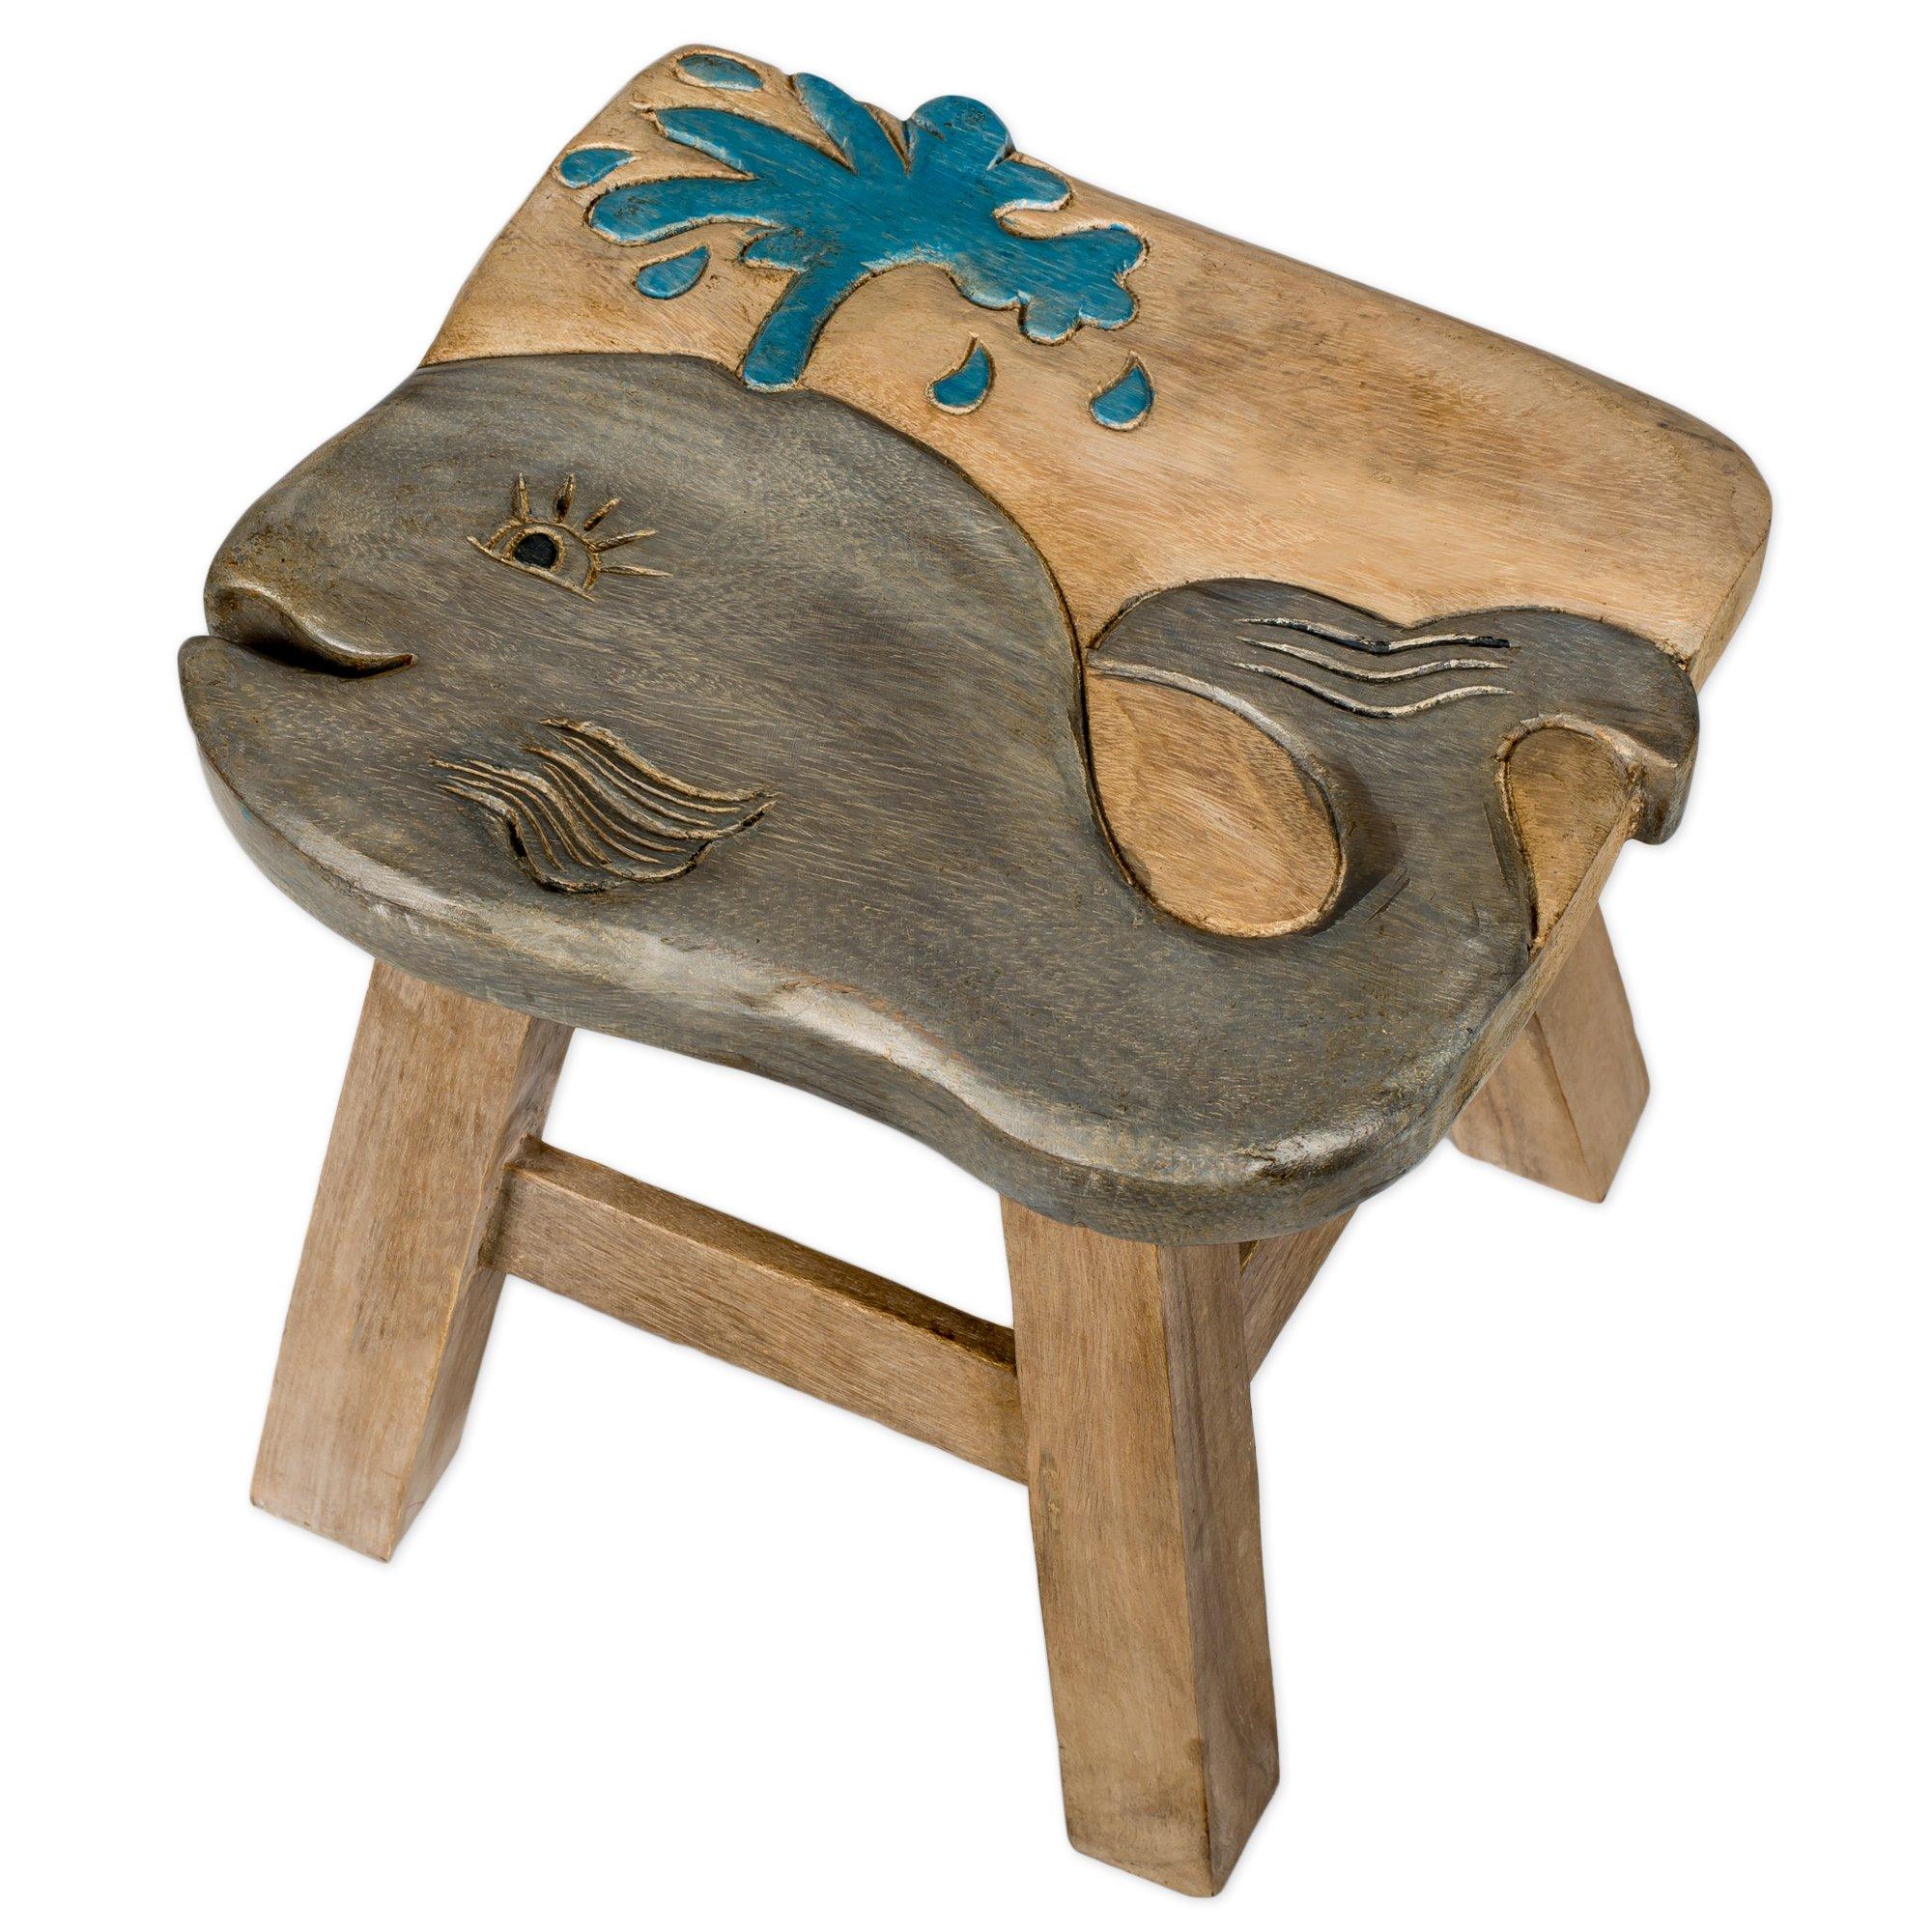 Whale Design Hand Carved Acacia Hardwood Decorative Short Stool